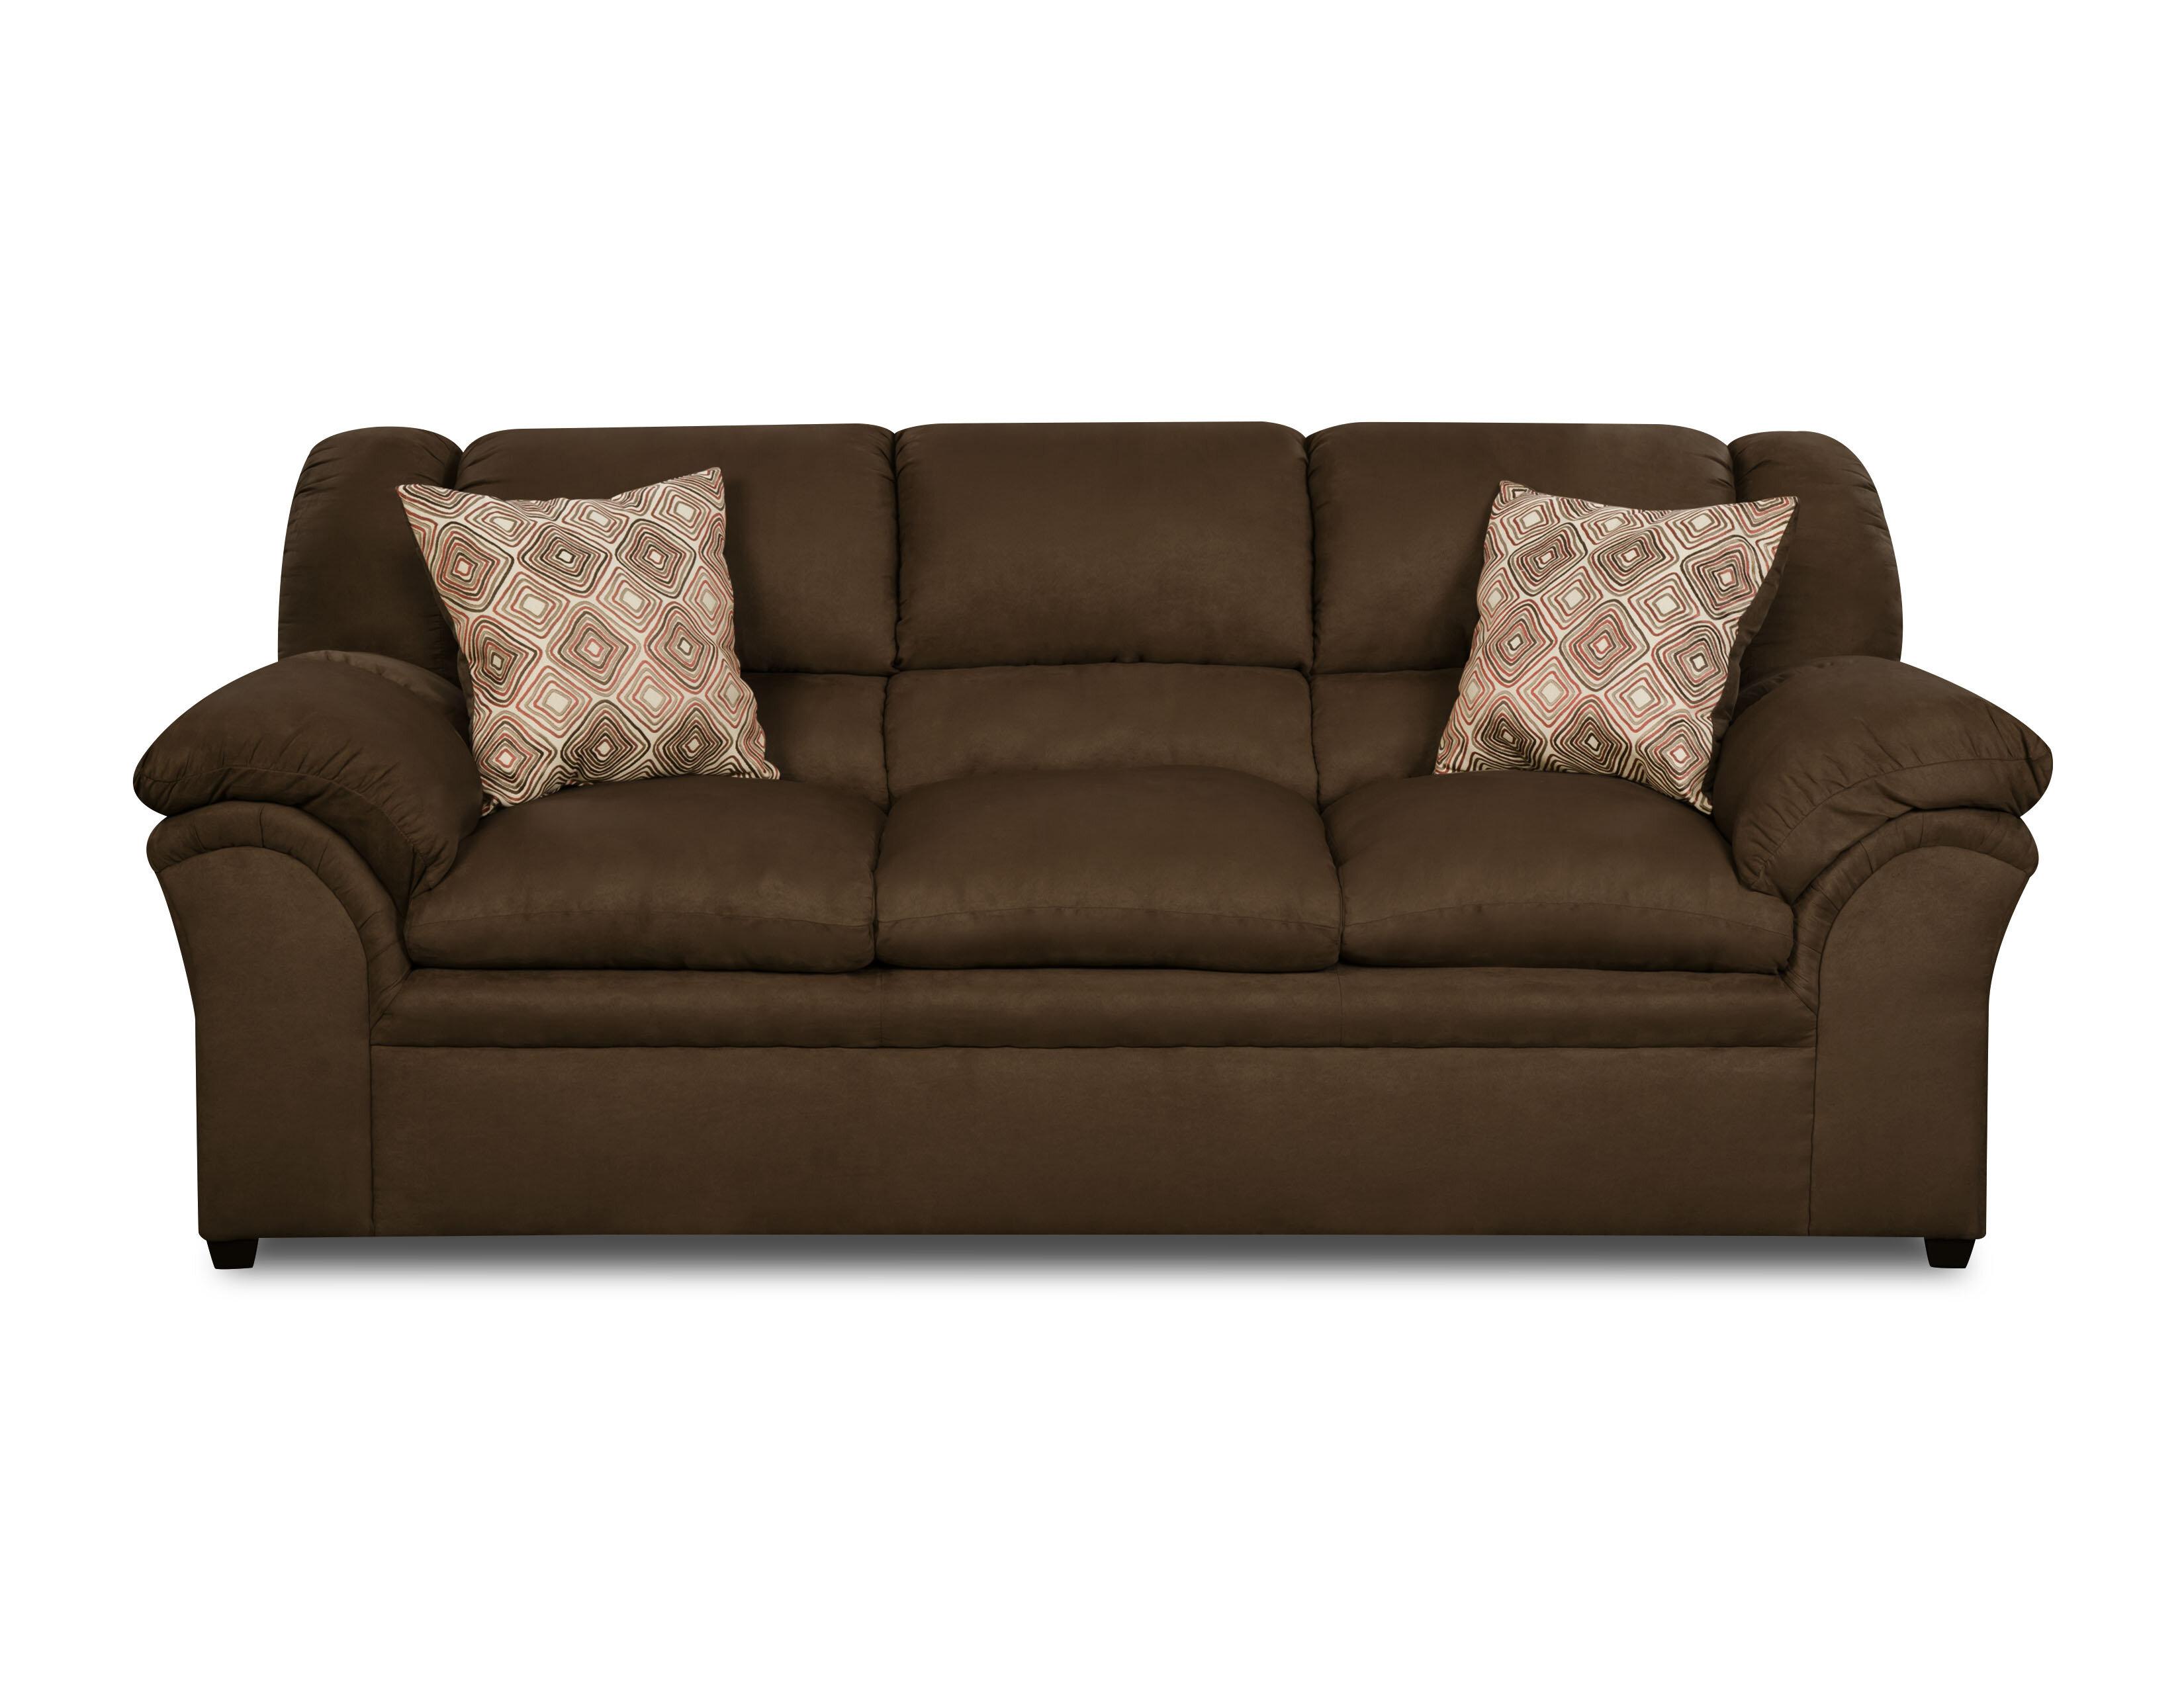 Alcott Hill Simmons Upholstery Beasley Sofa Reviews Wayfair